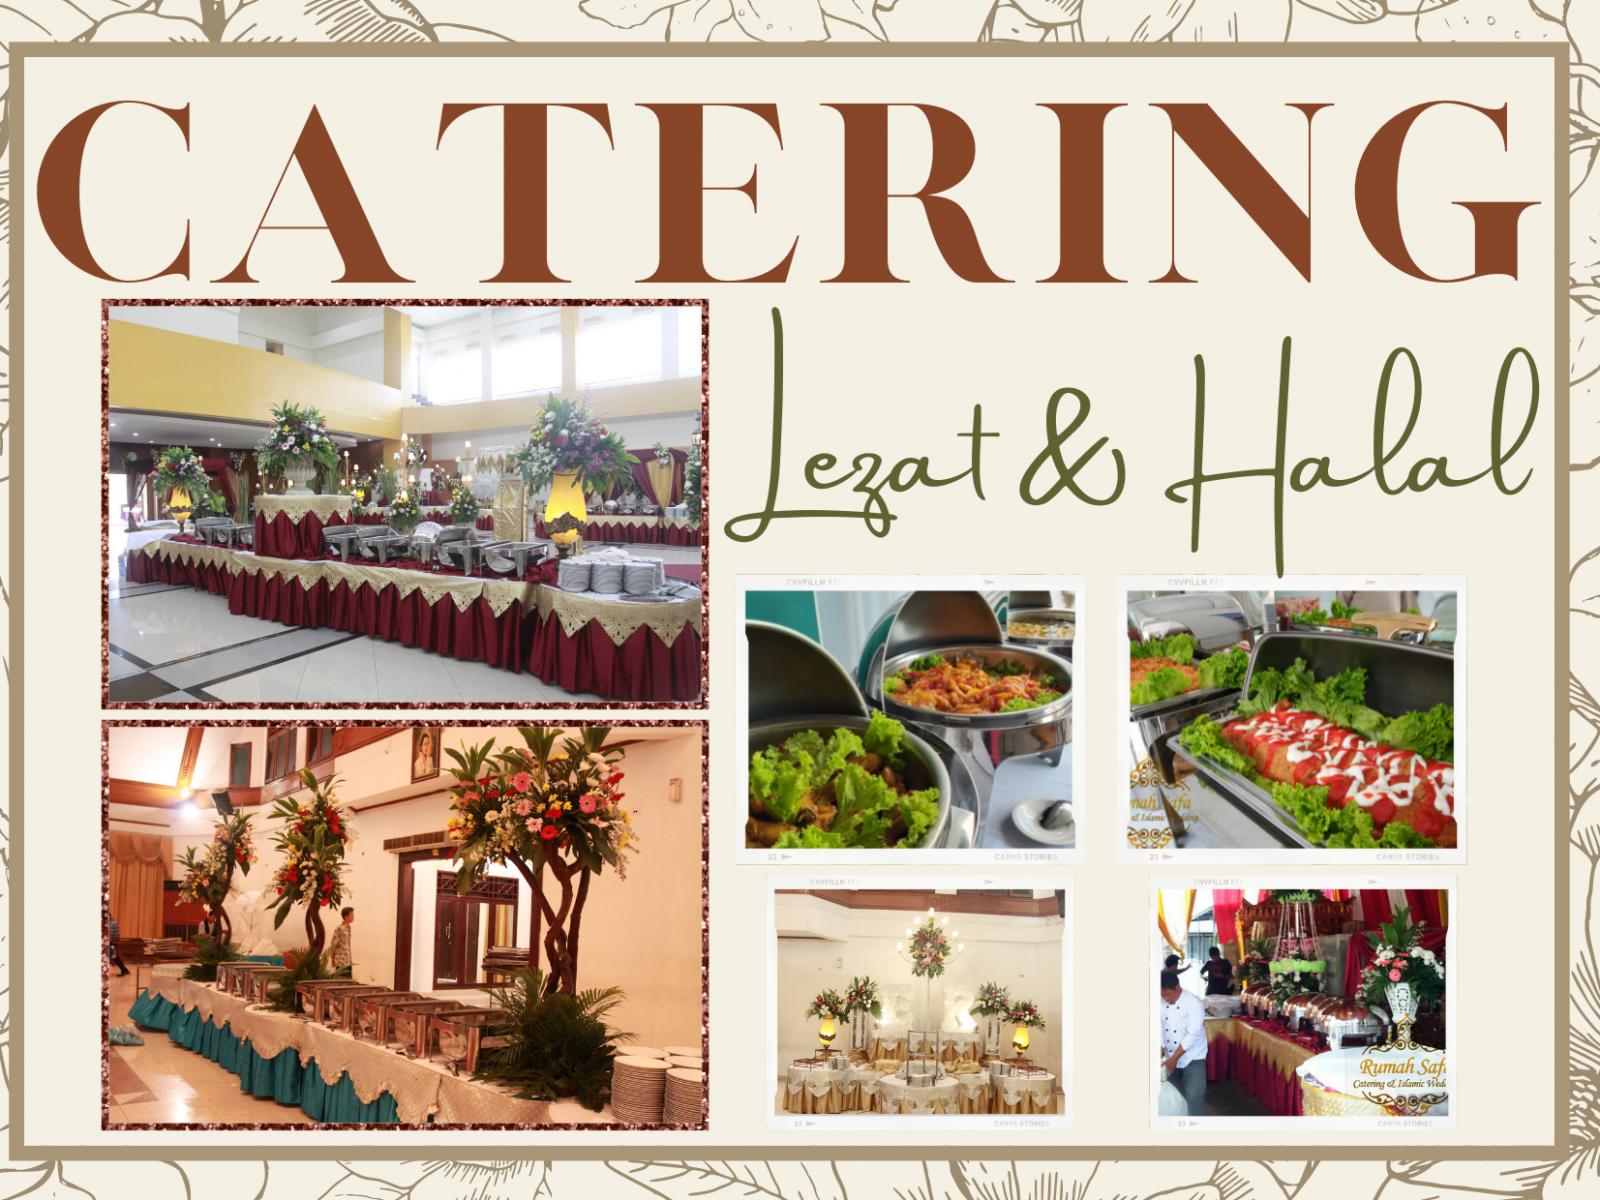 Rumah Safa Menyediakan Katering yang Halal, Lezat dan Beragam untuk keperluan berbagai event Wedding, Rapat, Pameran, Syukuran dll.